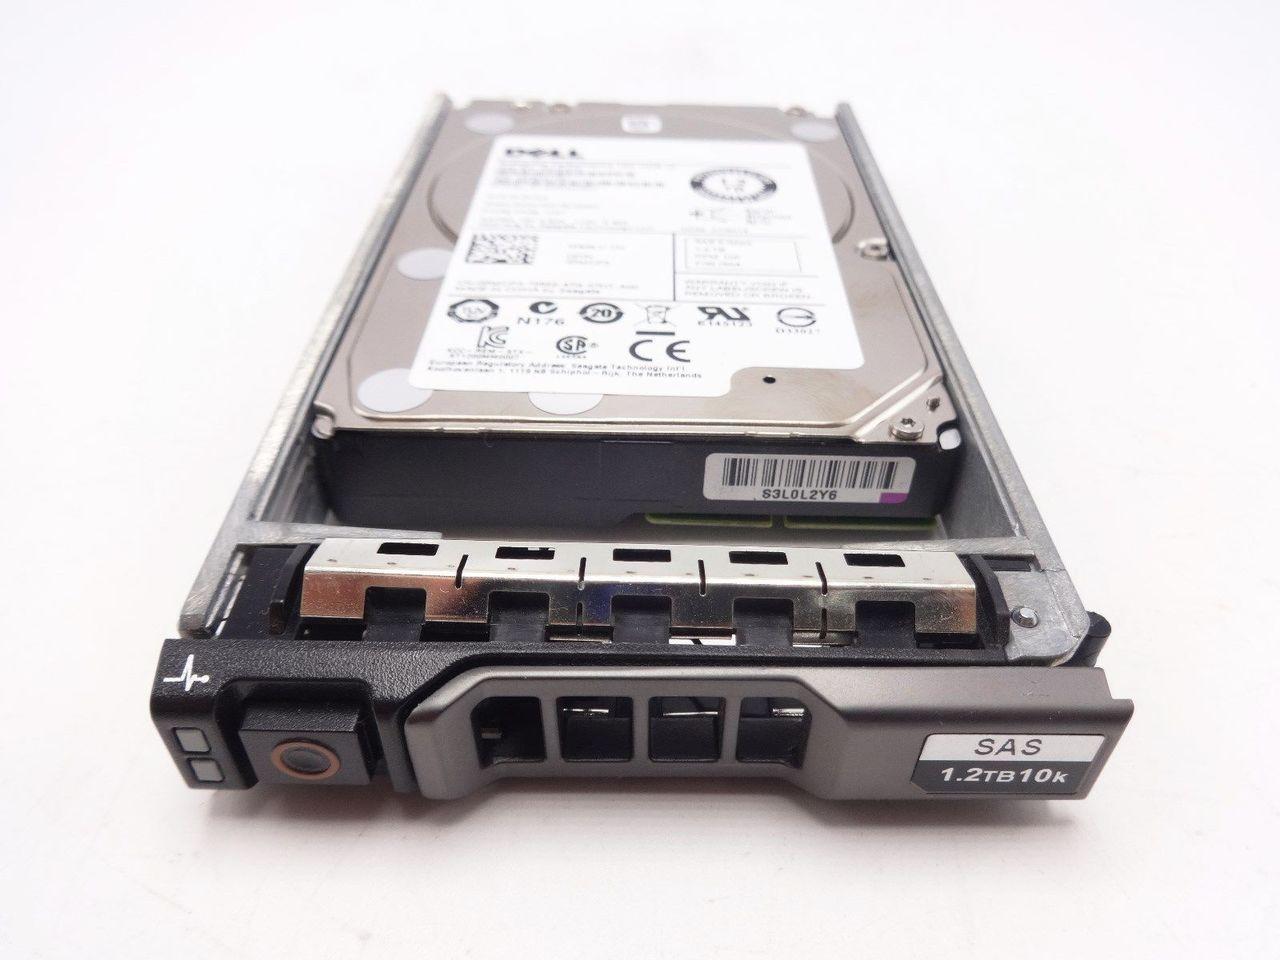 Dell RMCP3 1.2TB 10K 6GBPS SAS 2.5 hard drive ST1200MM0007